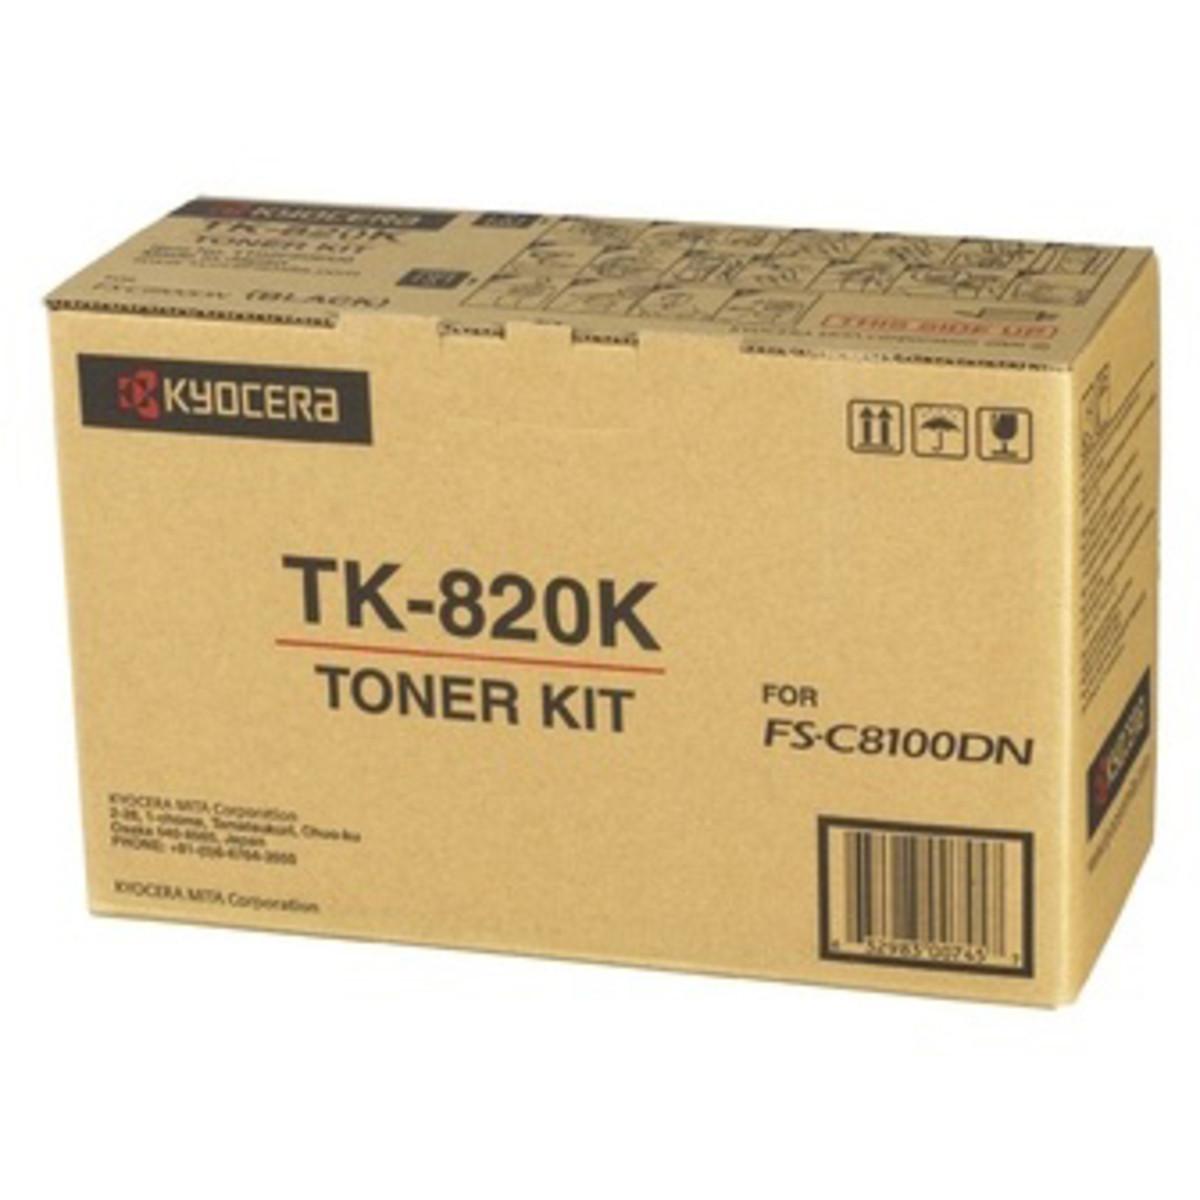 Kyocera TK-820K Black Toner Cartridge